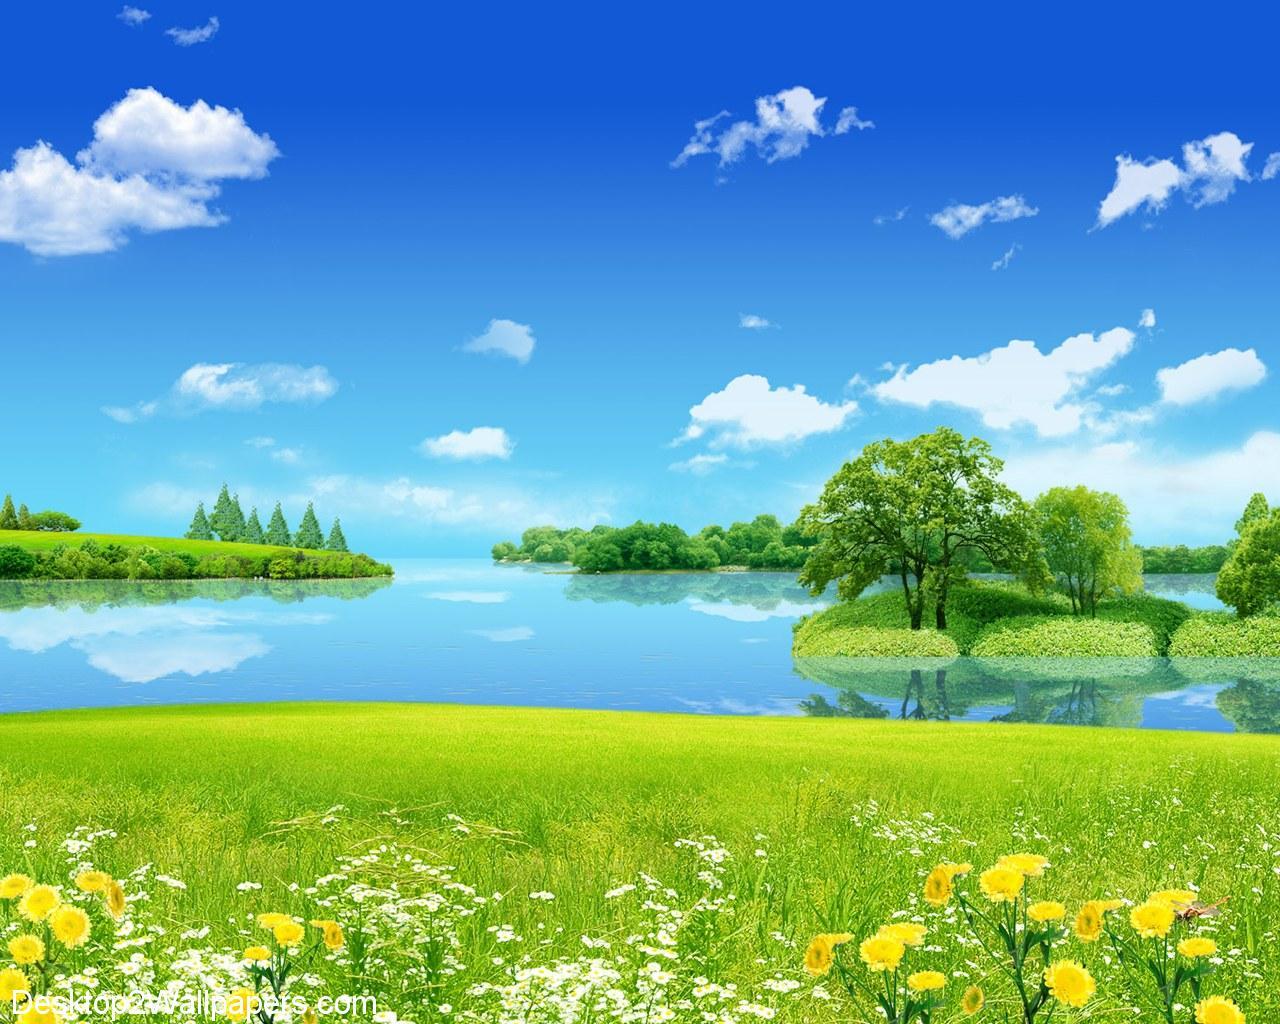 Wallpaper download 3d - Free 3d Wallpaper Download 58 Hd Wallpaper 3d Desktop Backgrounds